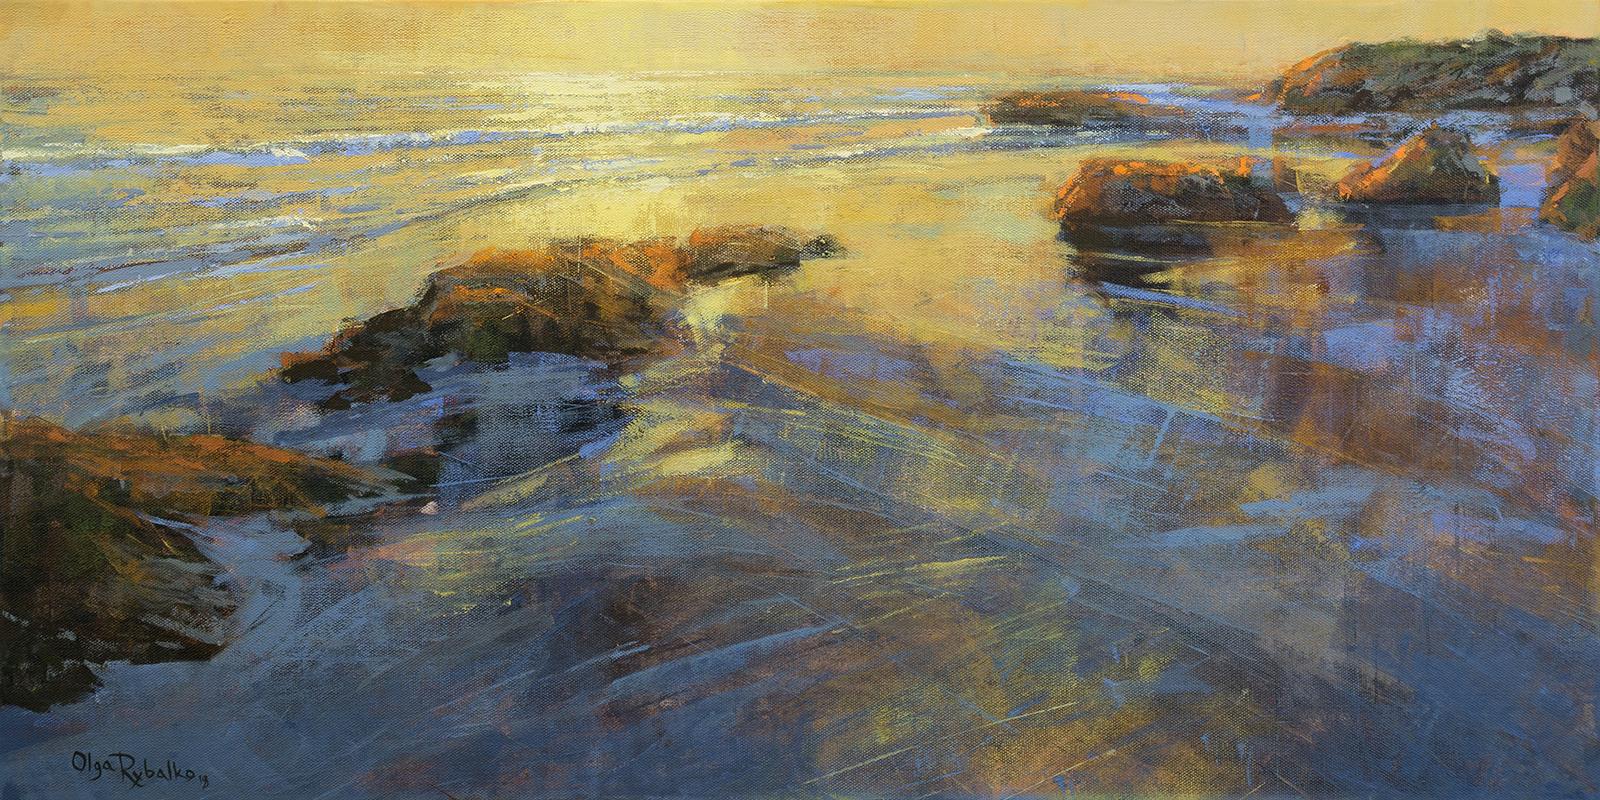 olga rybalko art - pacific rim - landscape painting-16.jpg